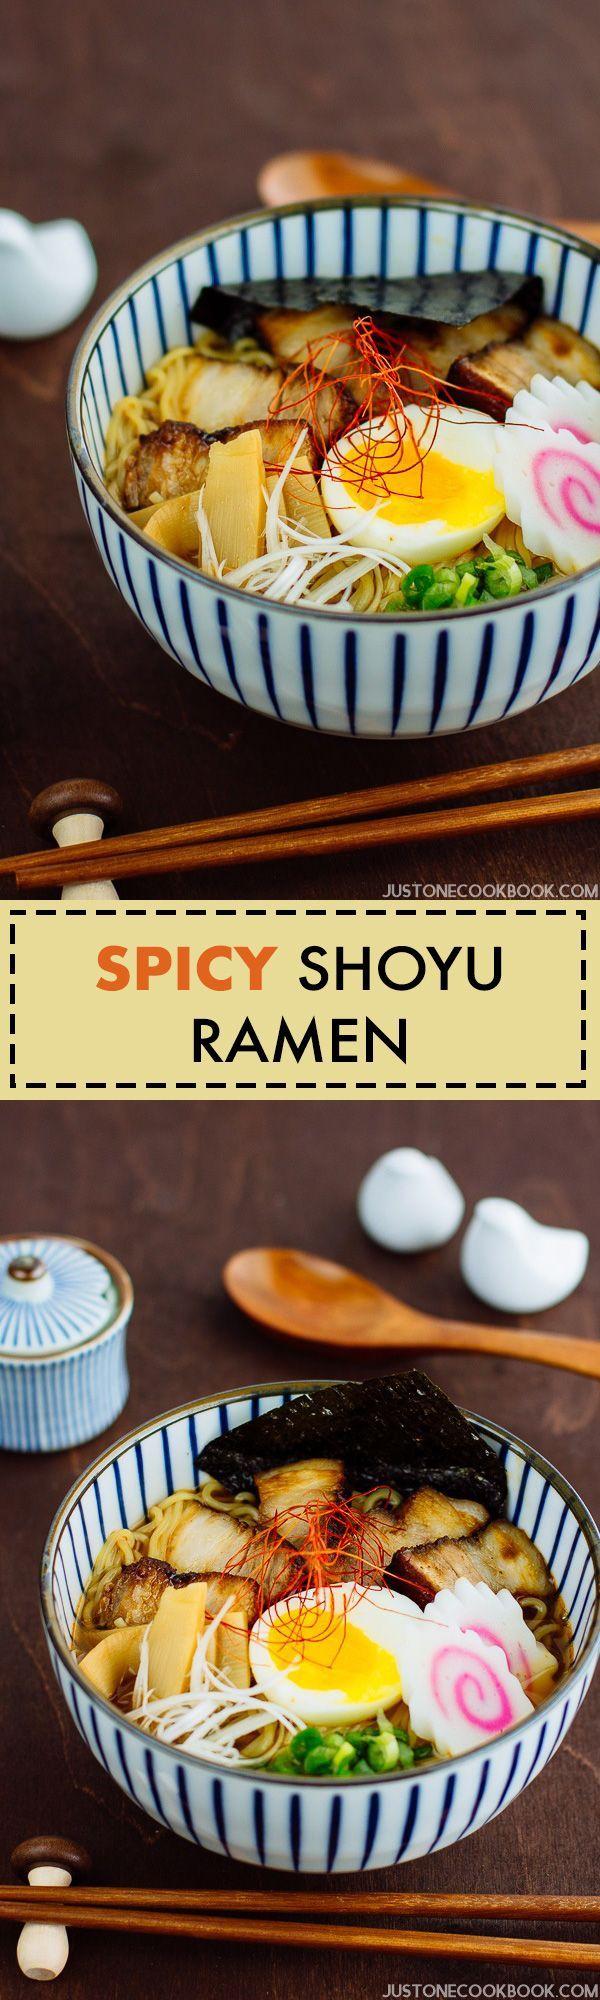 Spicy Shoyu Ramen スパイシー醤油ラメーン | Easy Japanese Recipes at JustOneCookbook.com